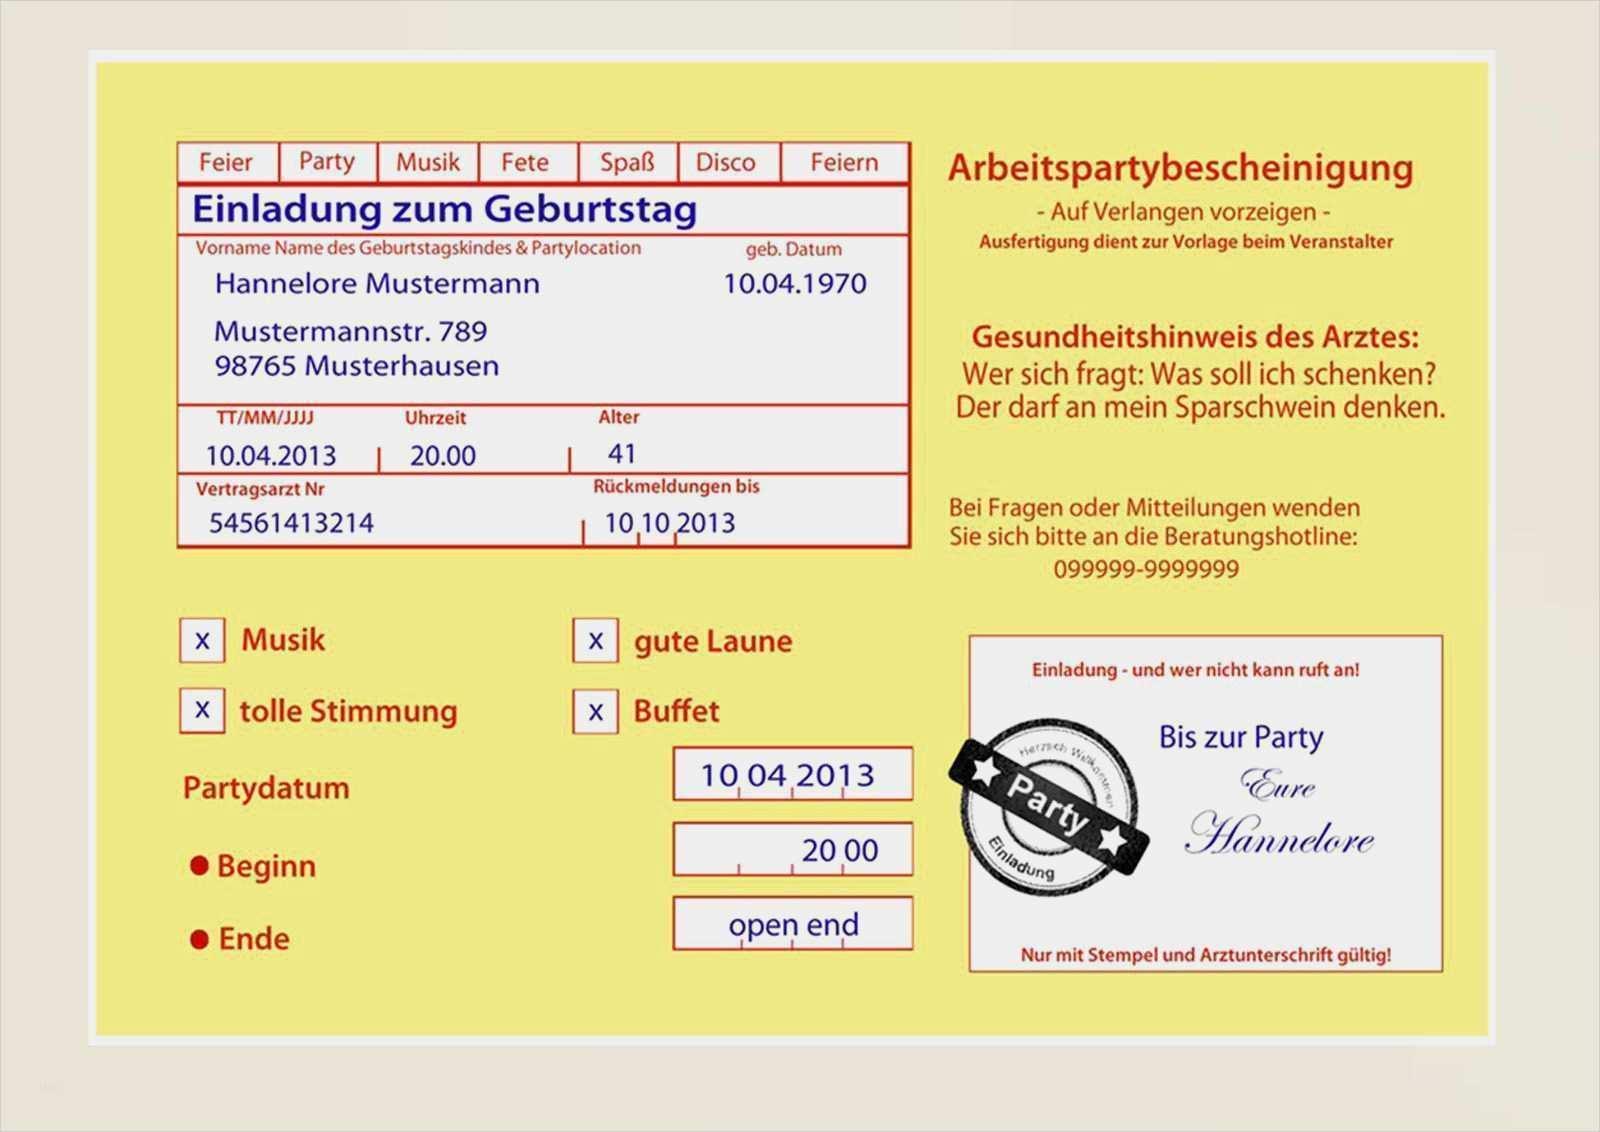 33 Gut Ankundigung Geburtstagsfeier Nachbarn Vorlage Ideen Einladung Geburtstag Einladung 50 Geburtstag Lustig Einladung 50 Geburtstag